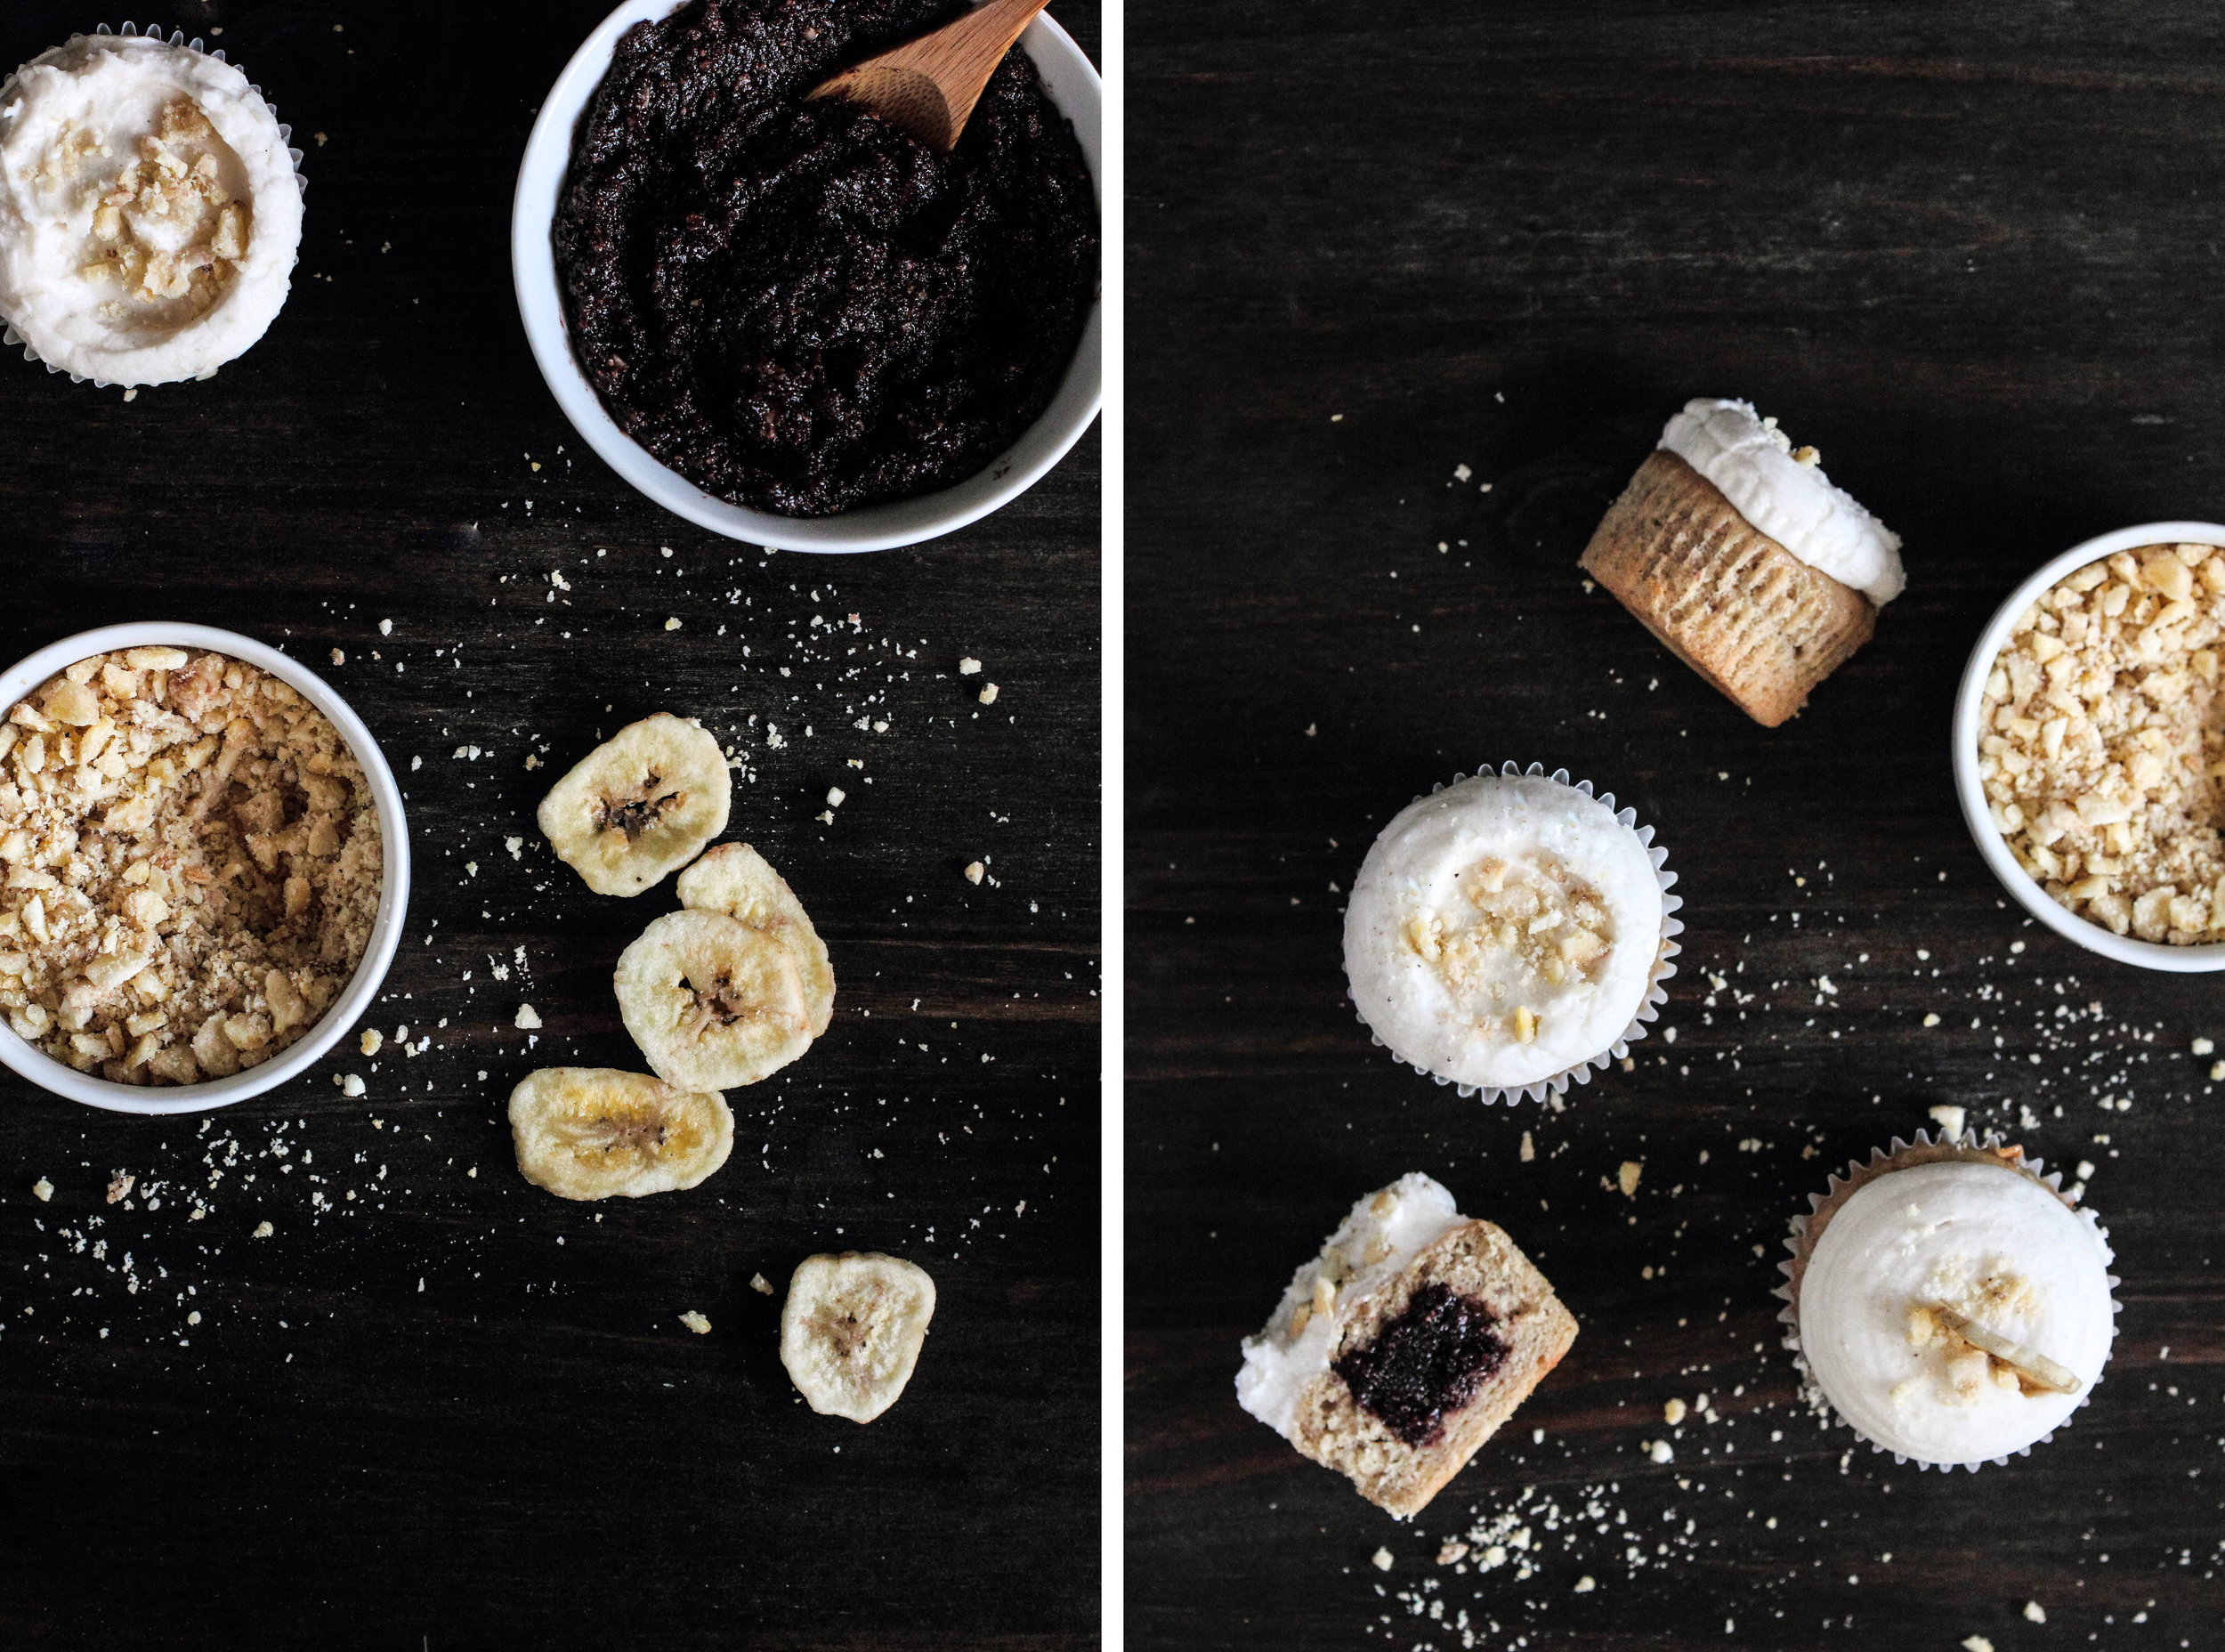 bananachocolatehazelnutcupcakes1.jpg